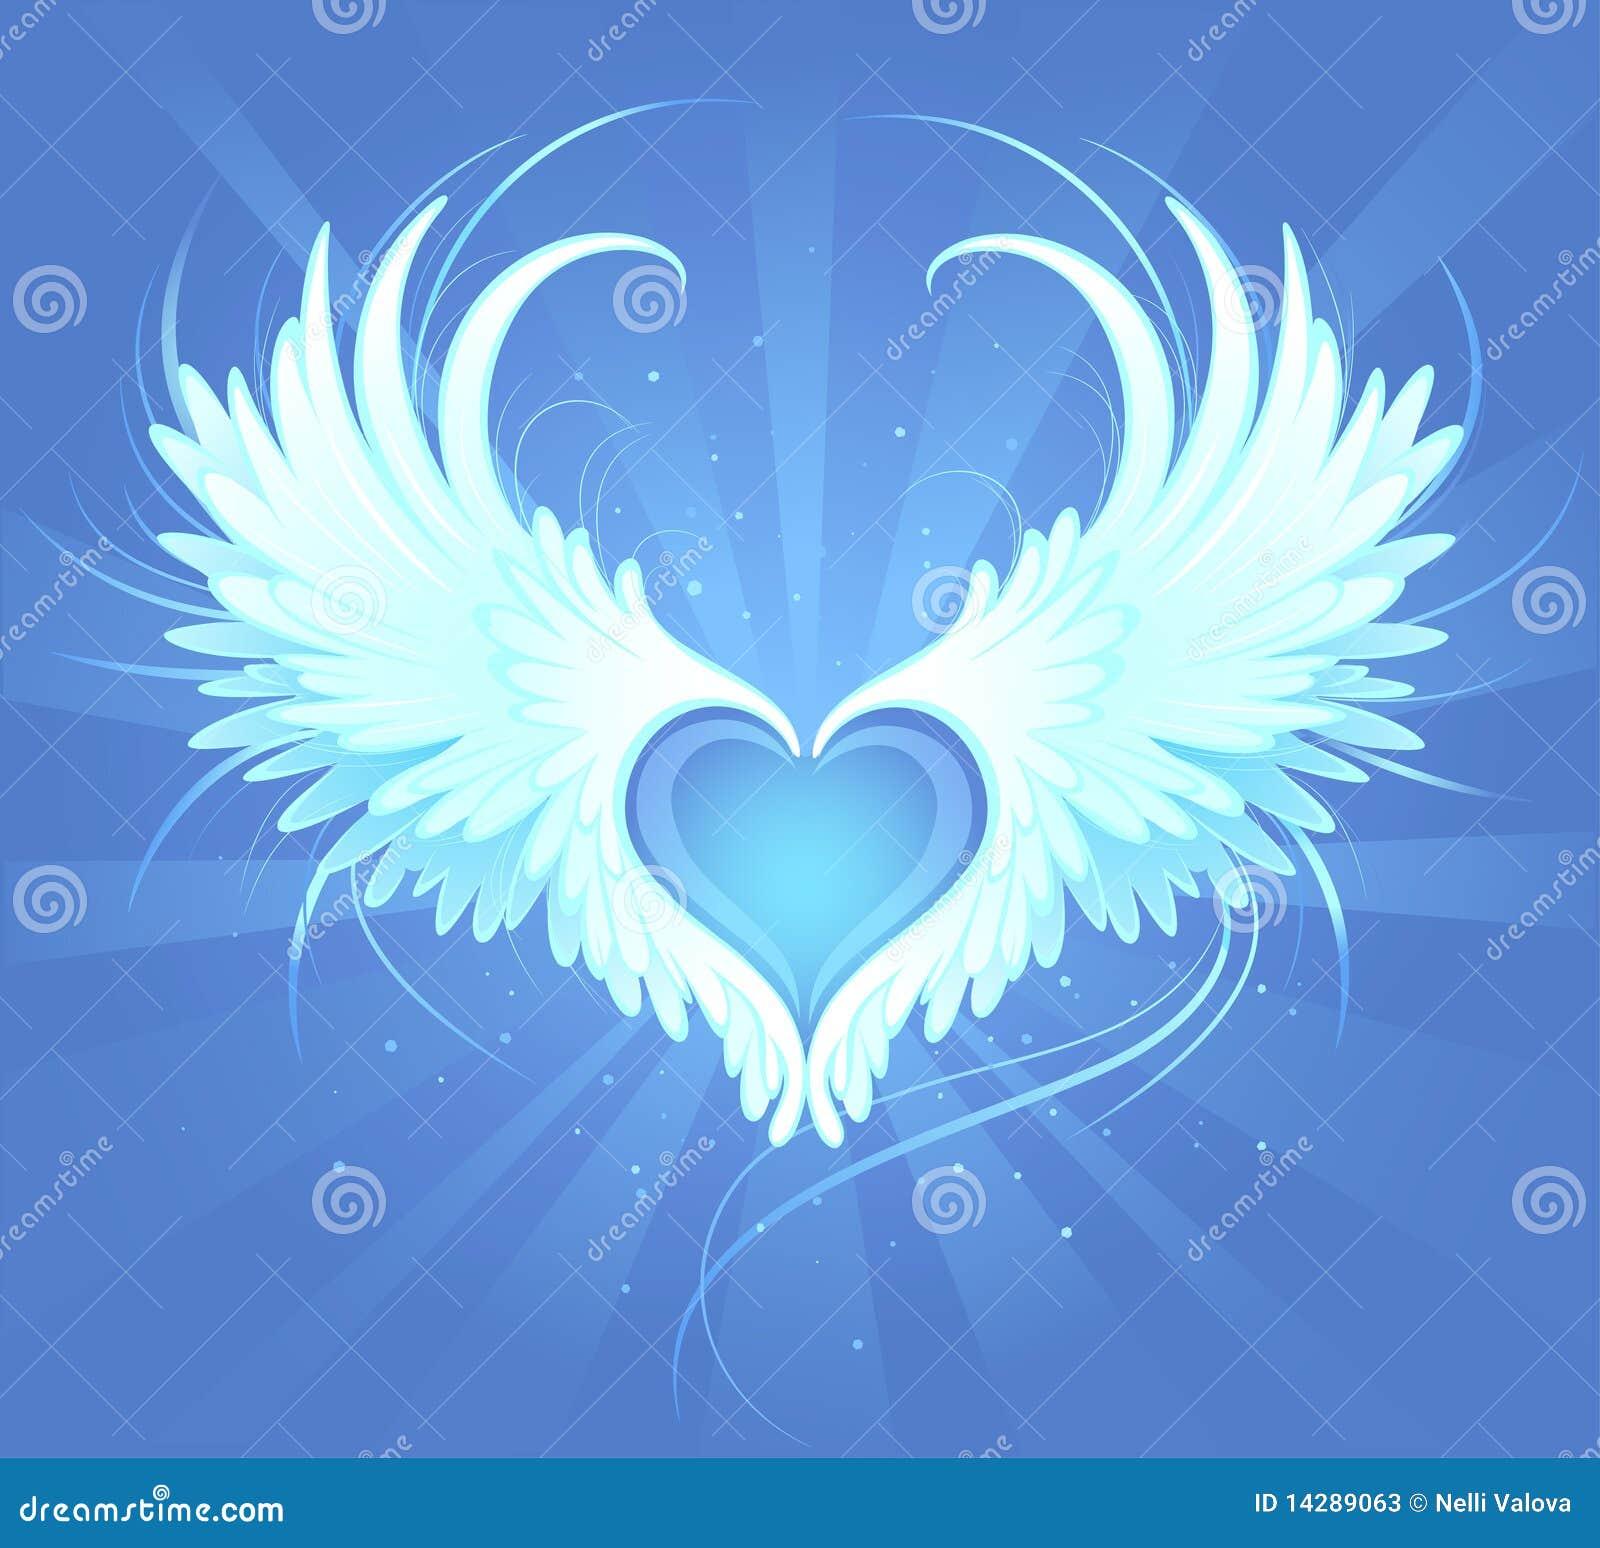 realistic angel wings